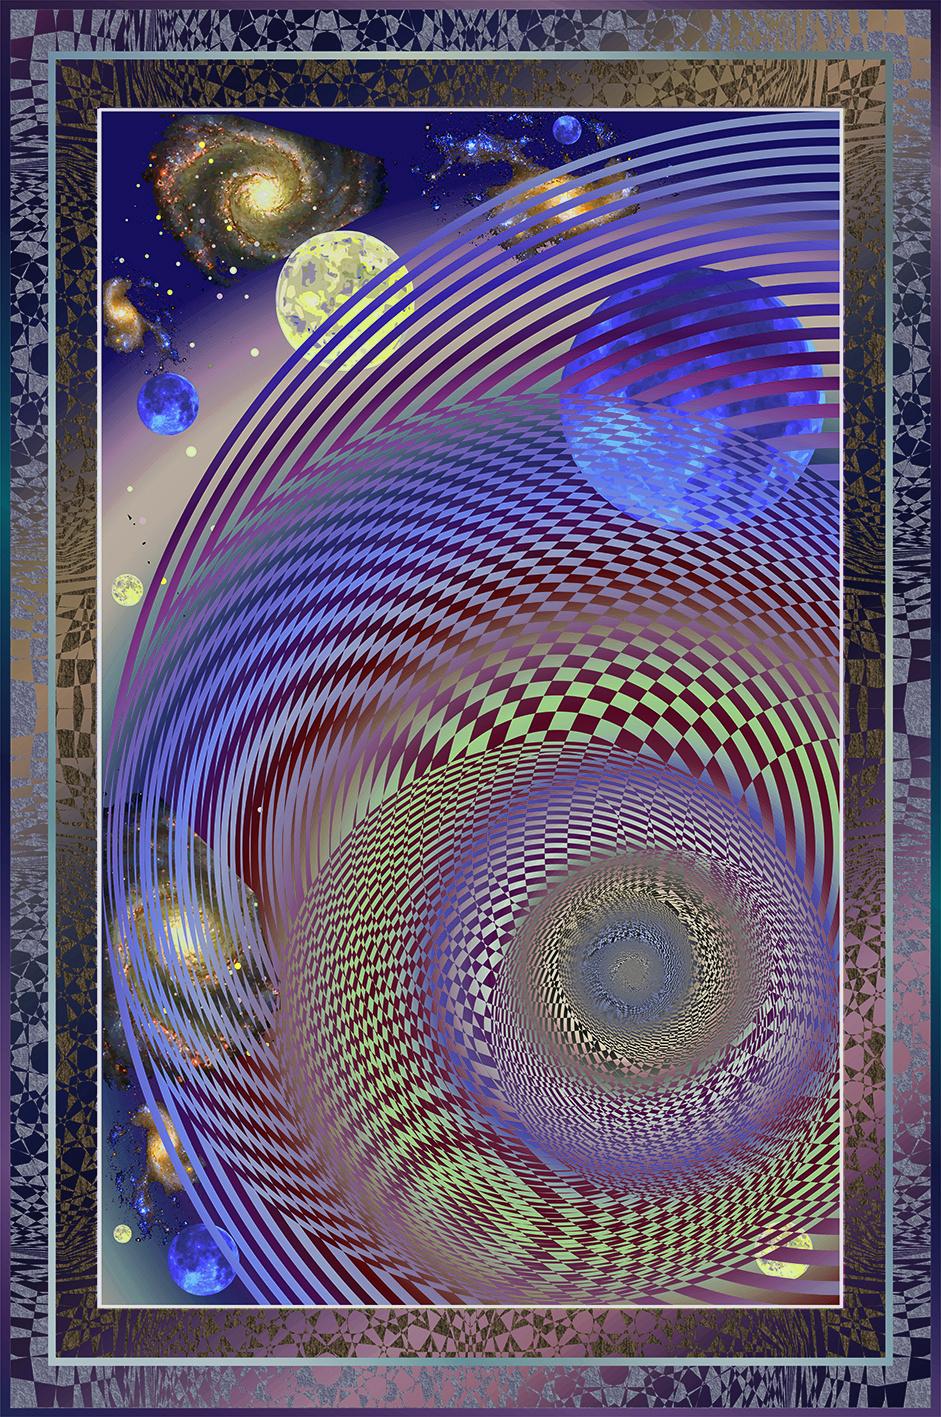 Юрий Николаевич Сафонов (Yury Safonov). Initialize the dark matter of dark energy